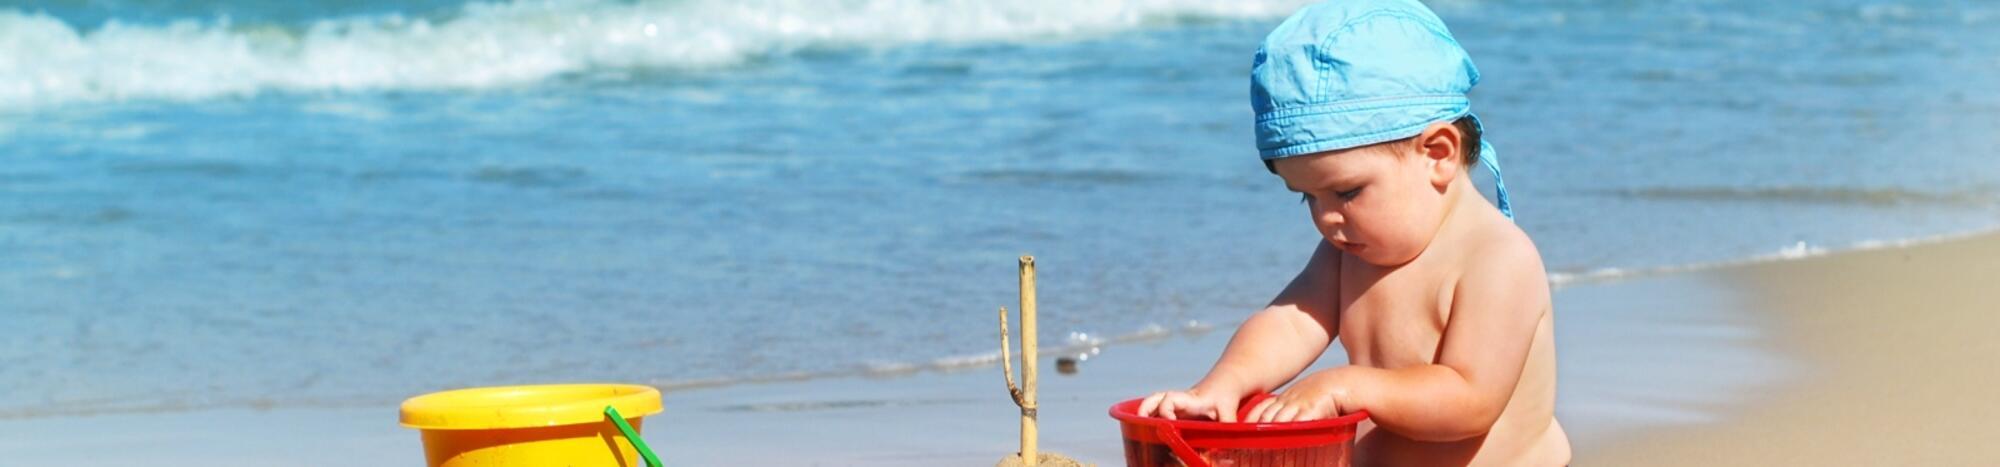 Angebot Ende Juni Rimini im Hotel in Meeresnähe mit Familienangebot